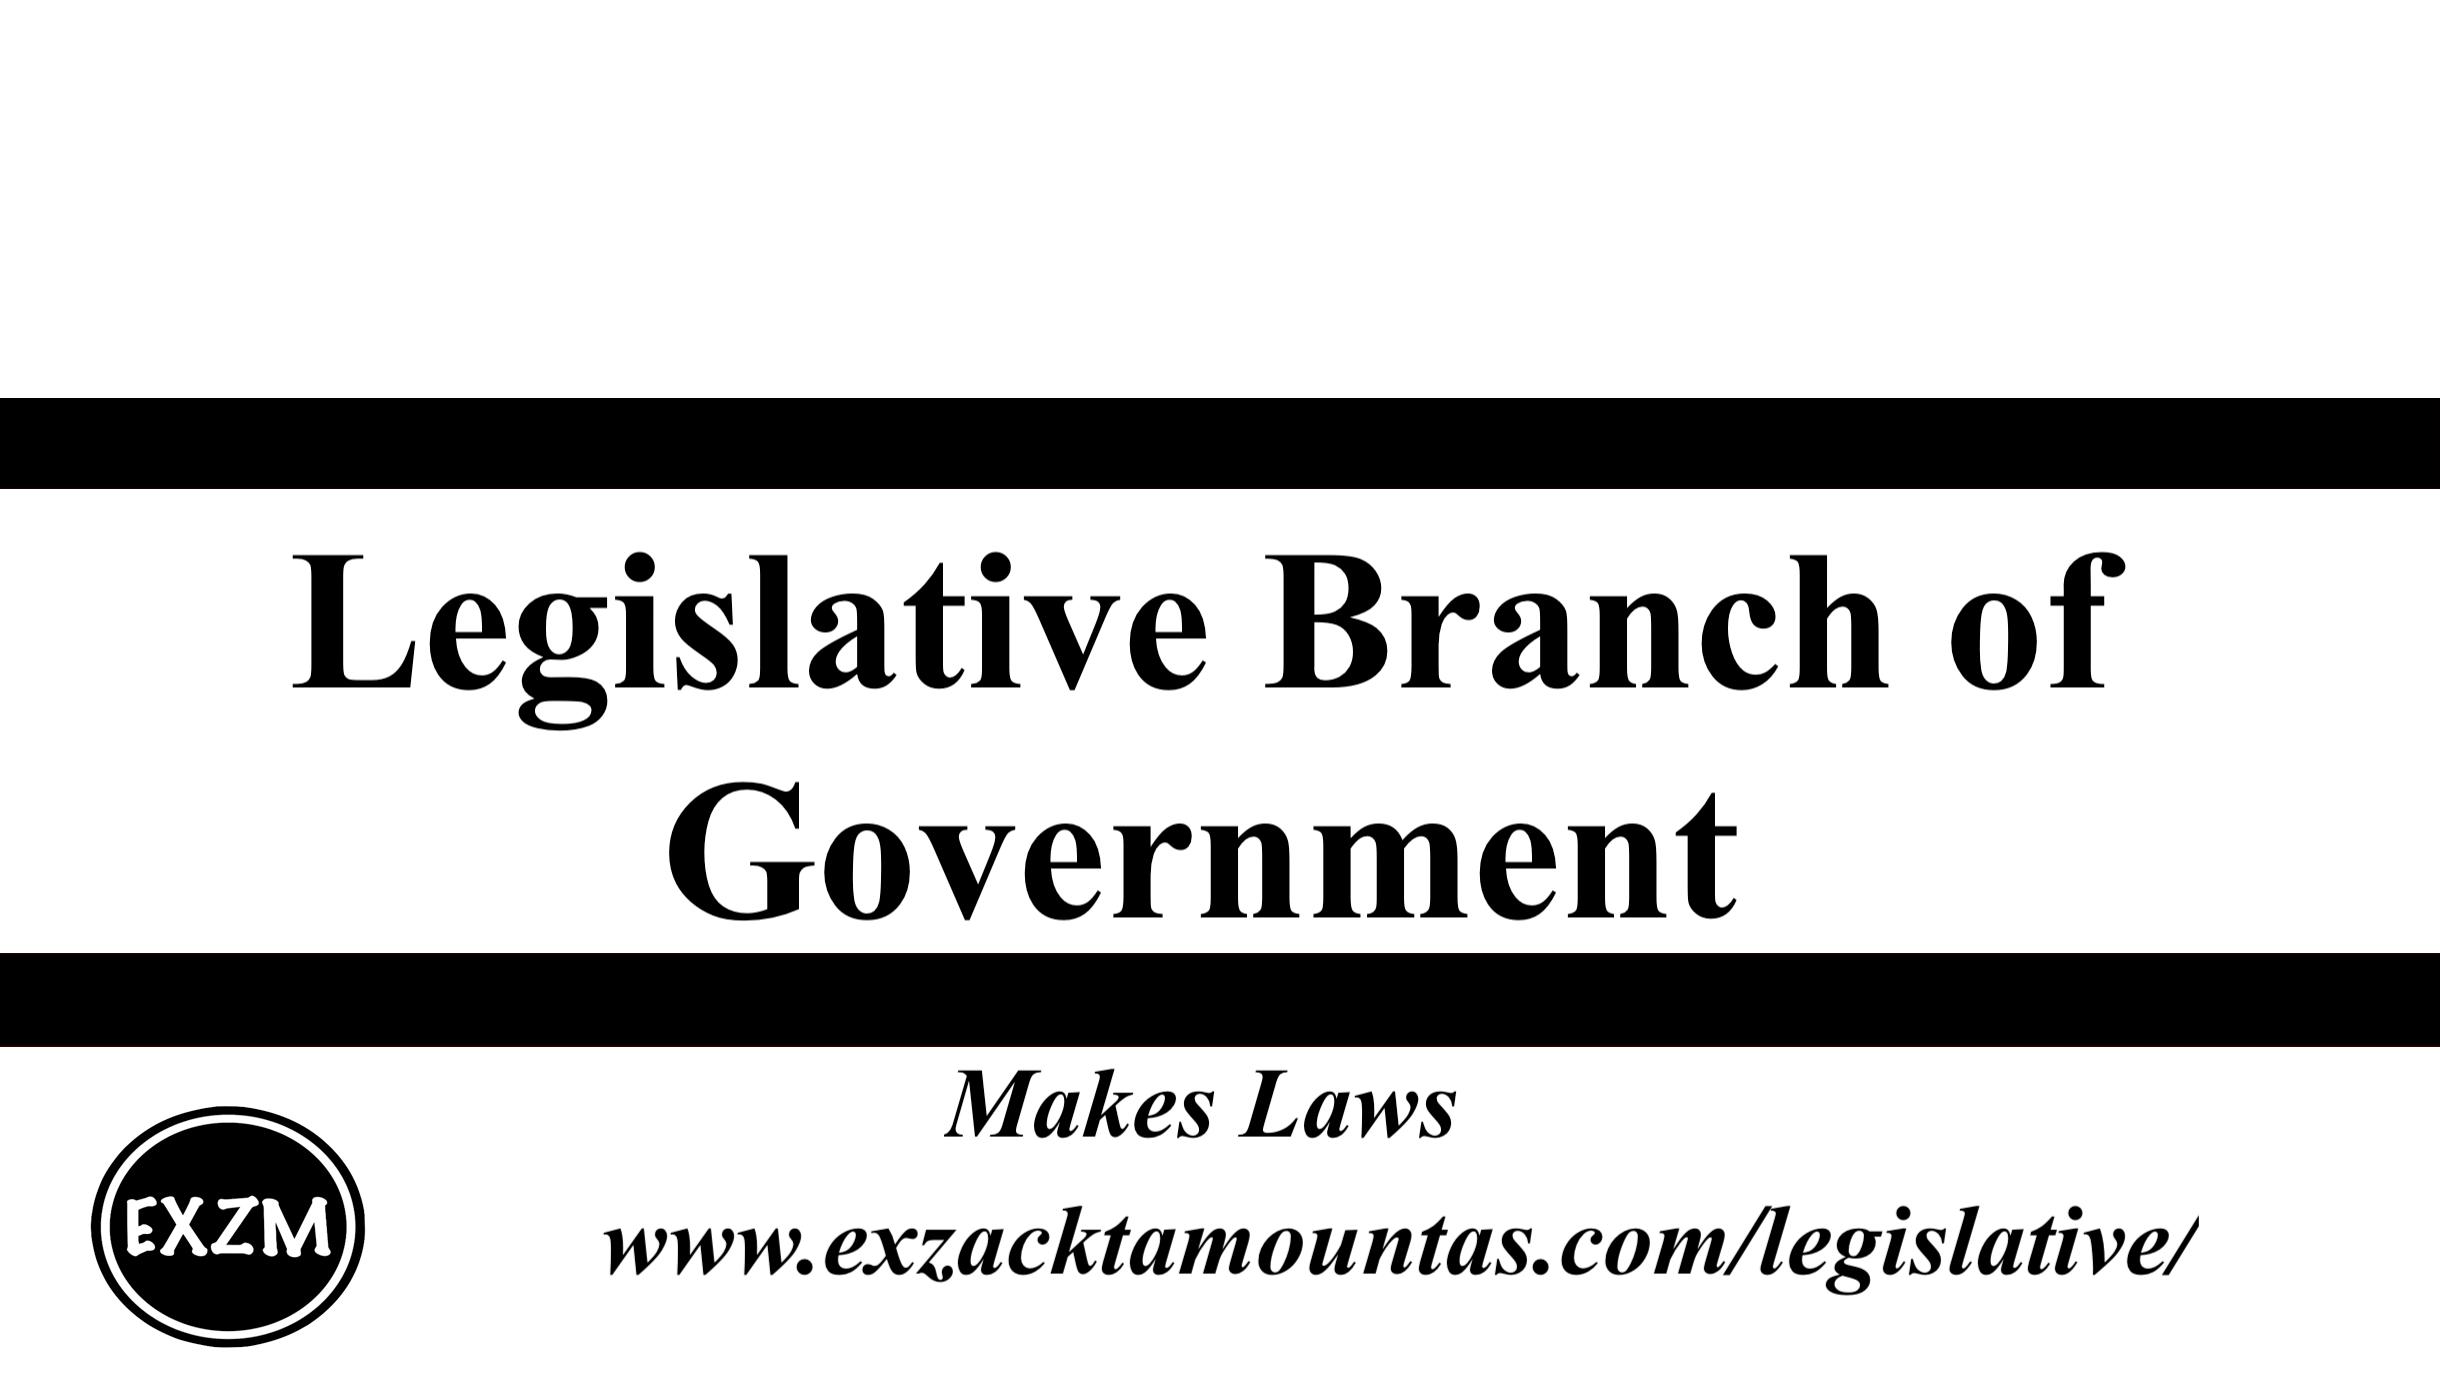 Legislative Branch of Gov EXZM 9 30 2019